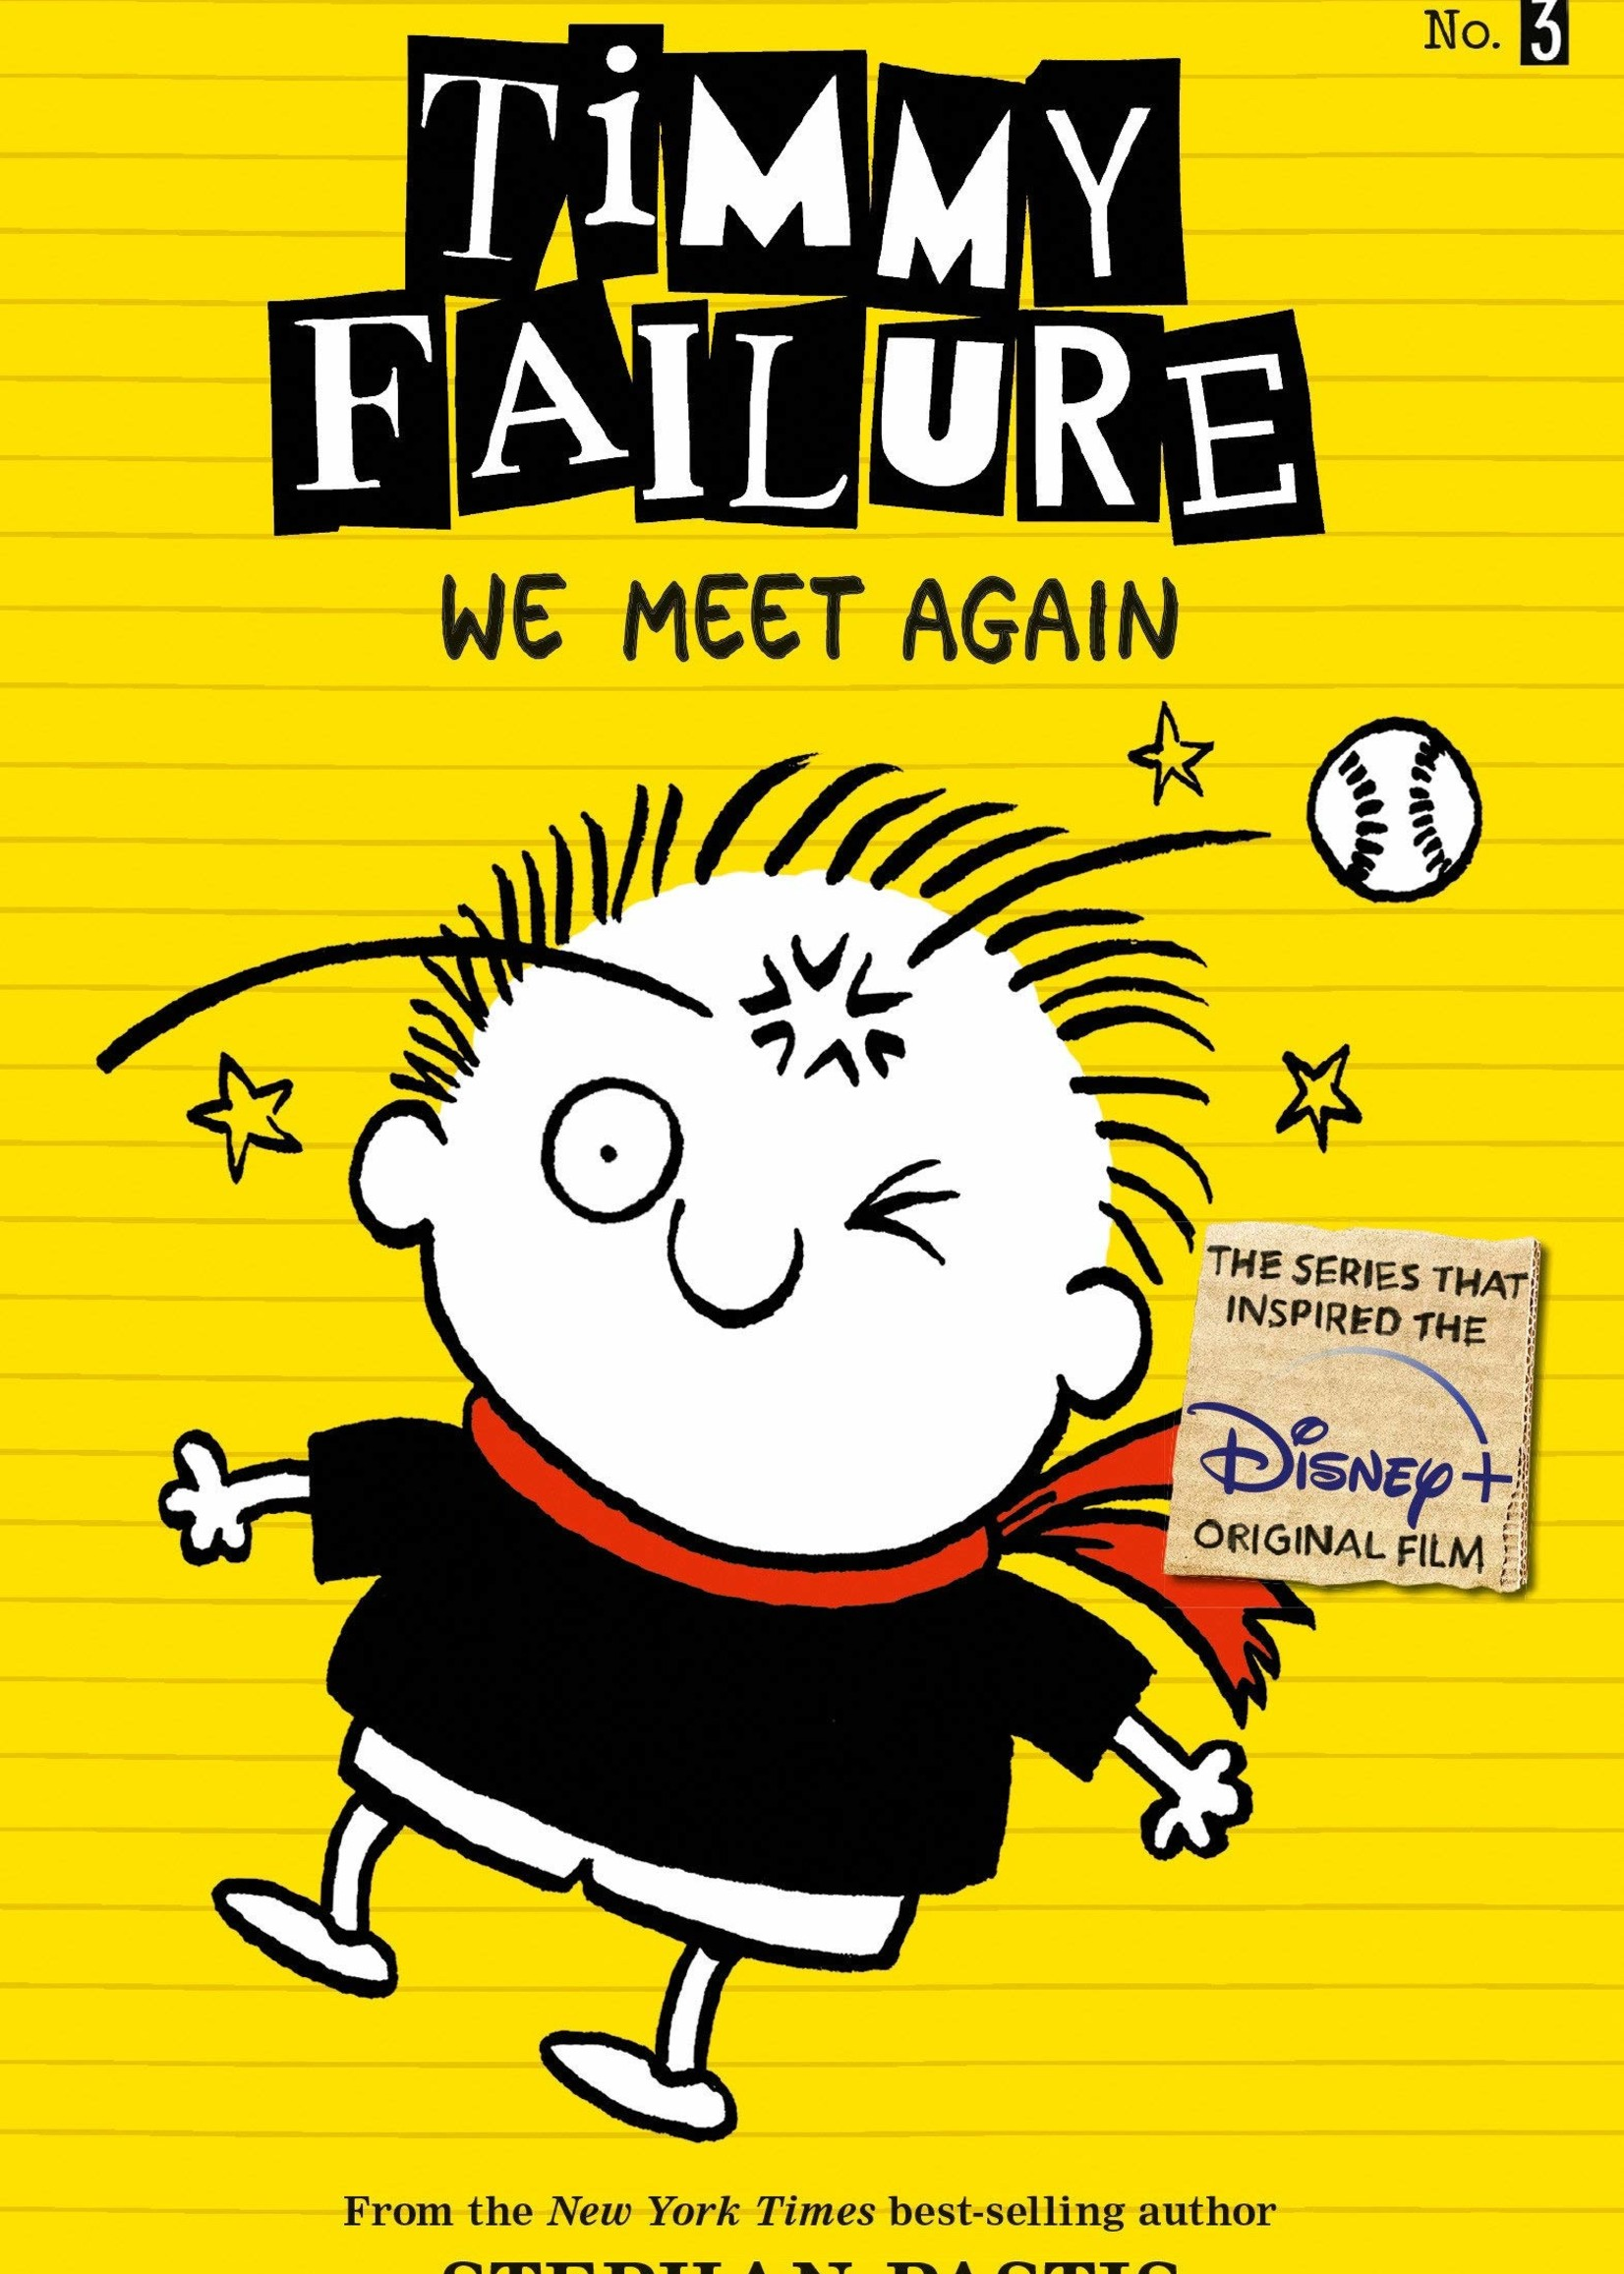 Timmy Failure #03 Illustrated Novel, We Meet Again - Paperback